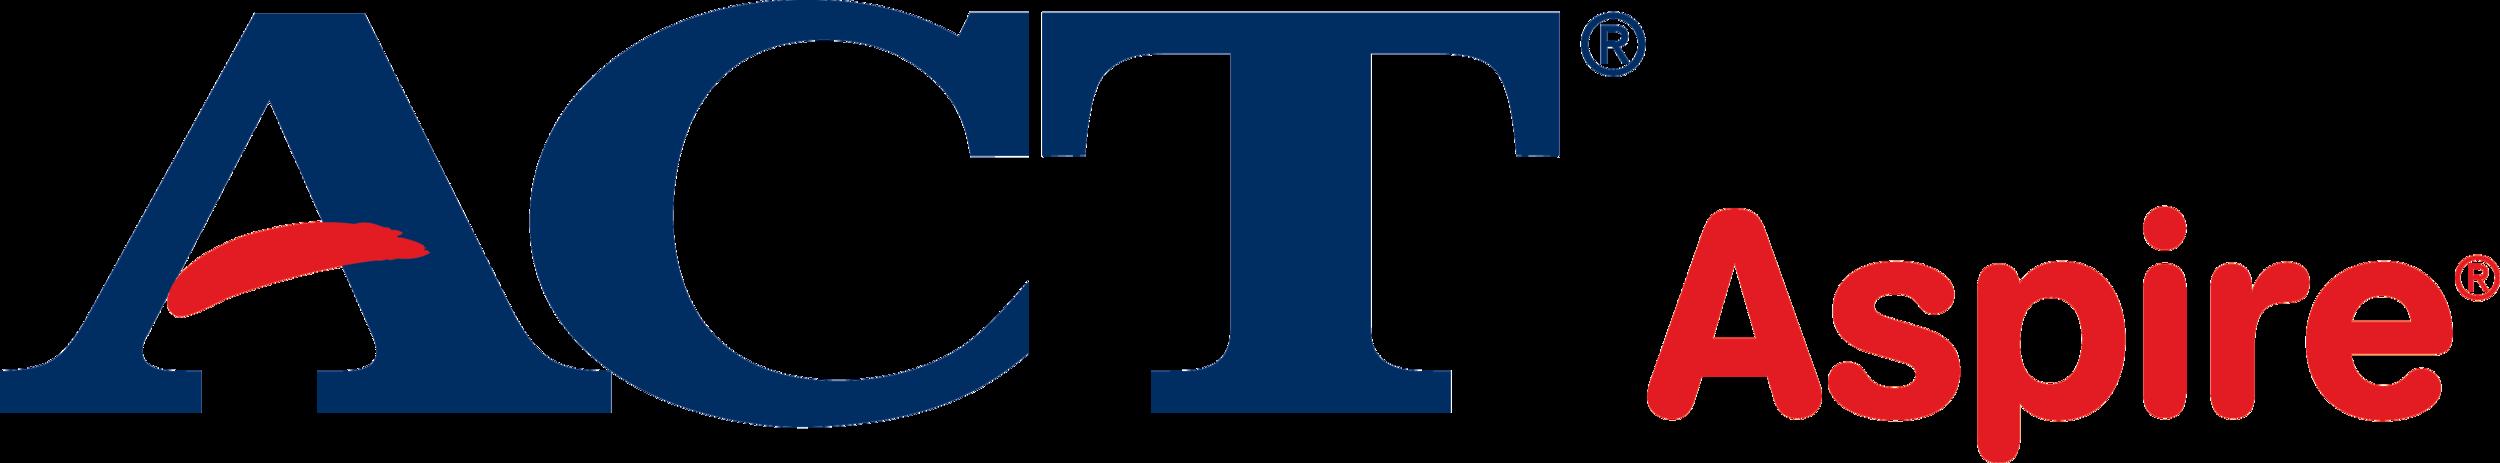 ACTAspire_Logo.png